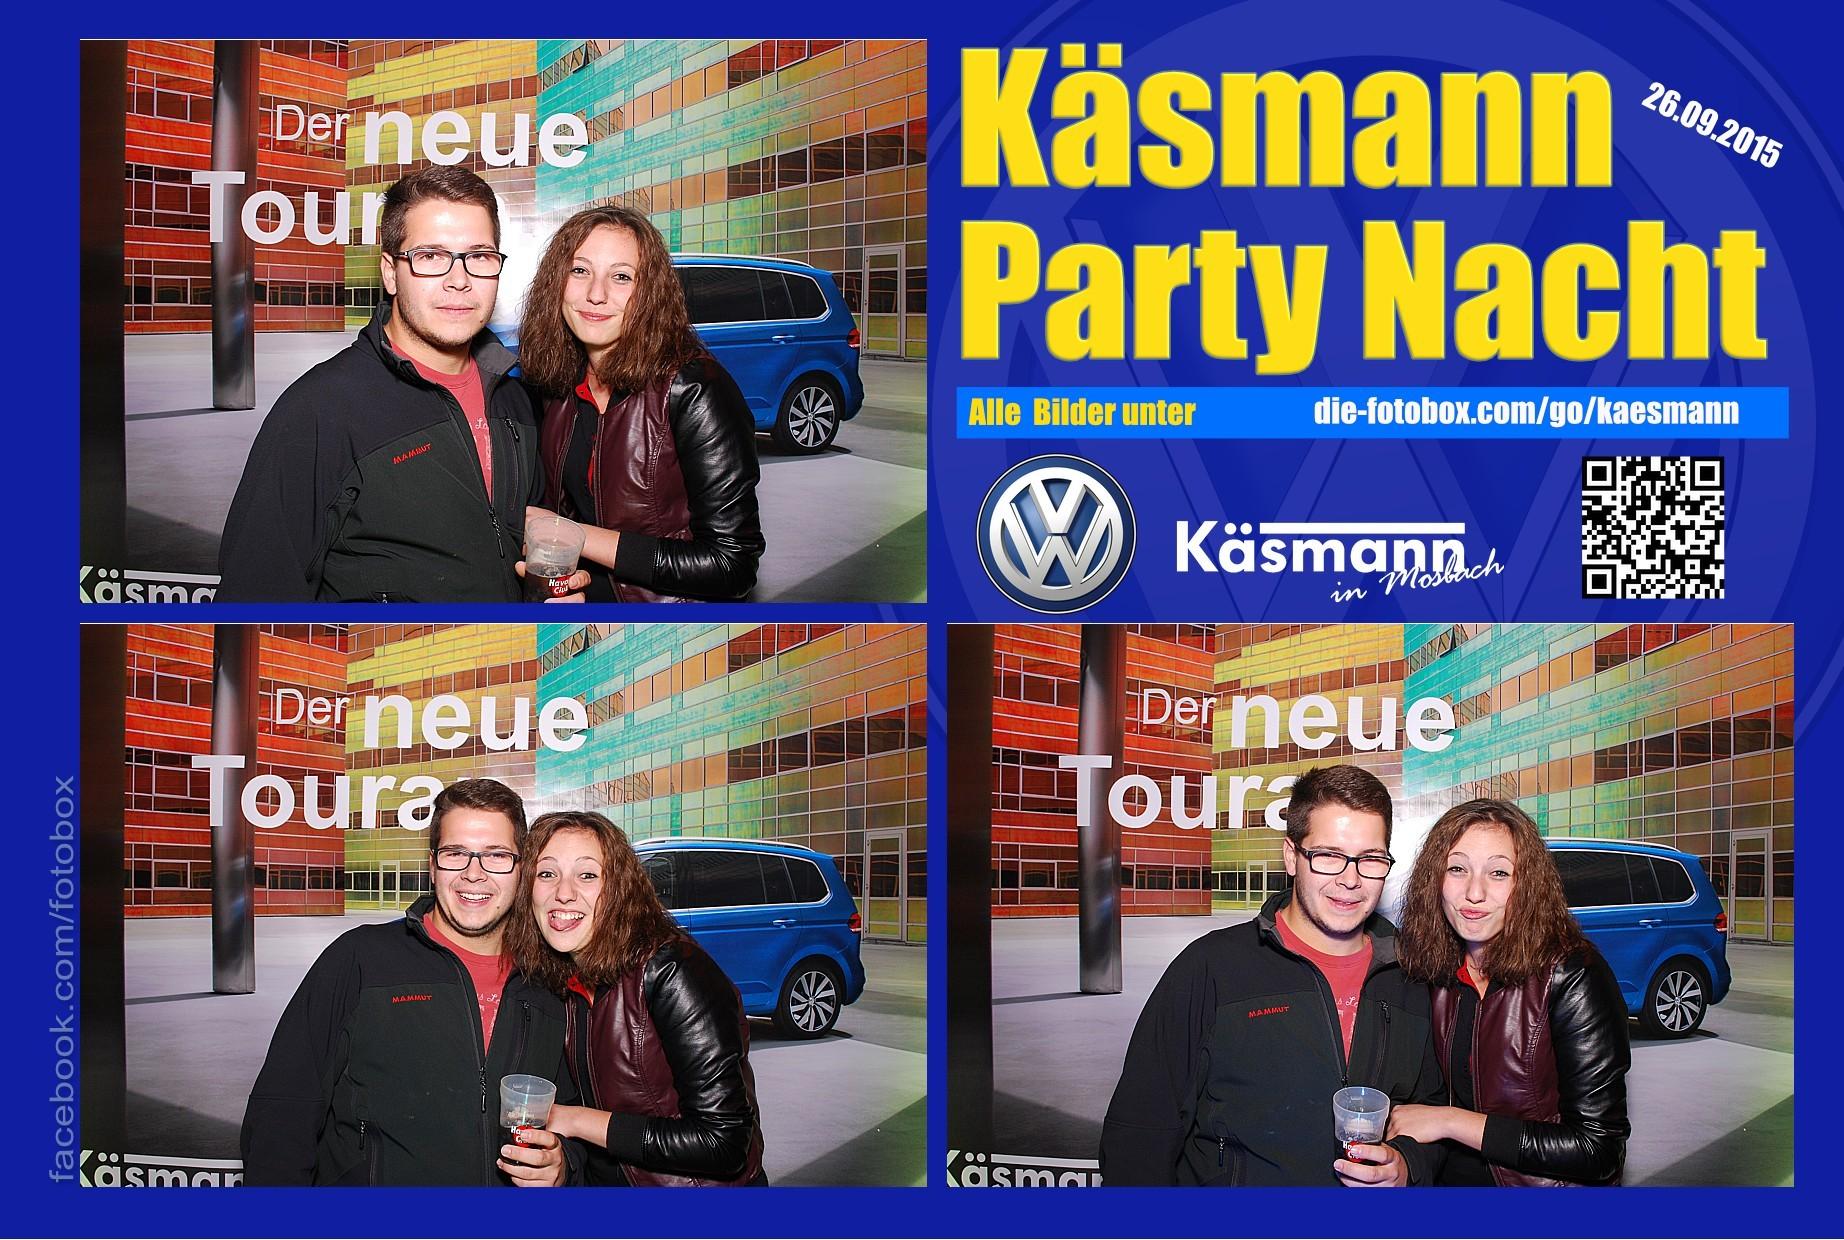 Käsmannparty 2015 - www.die-fotobox.com 01340